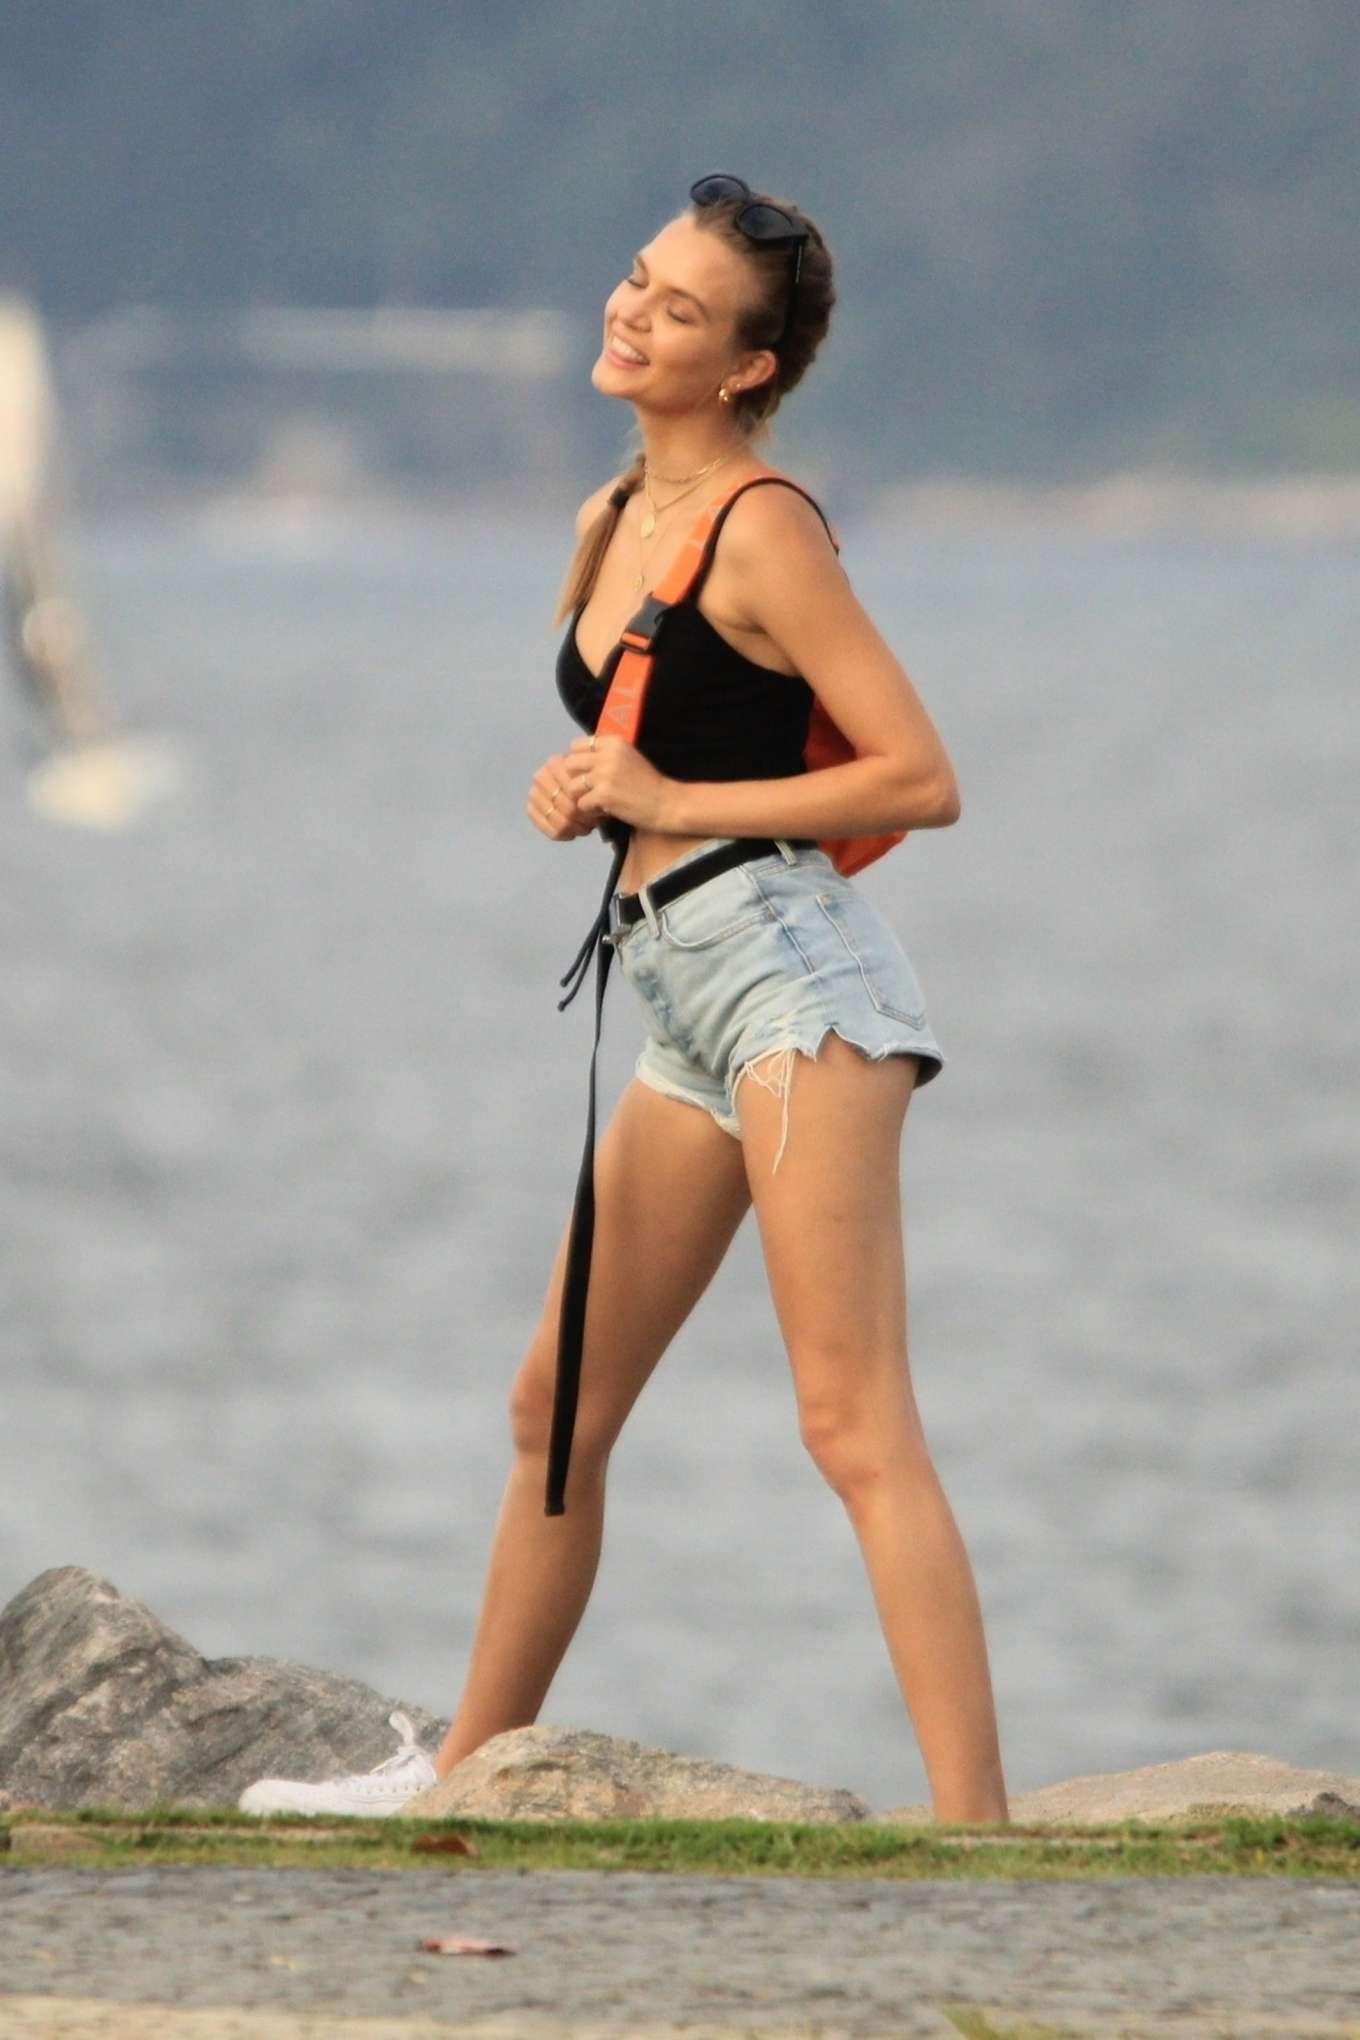 Josephine Skriver in Denim Shorts - Posing for pictures in Rio de Janeiro